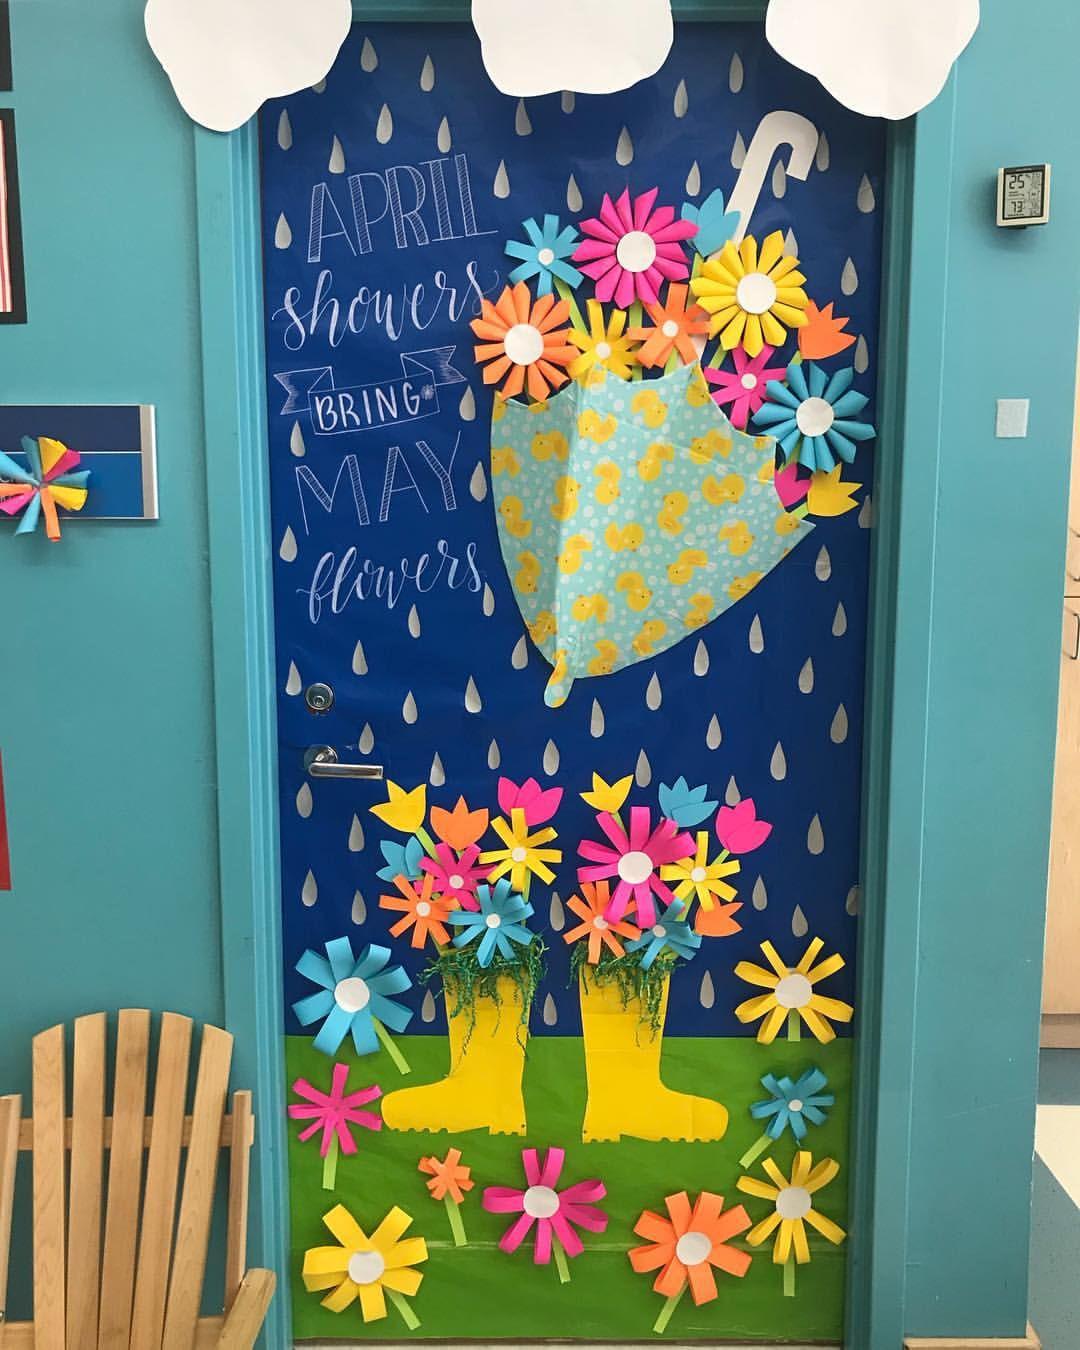 Spring Classroom Door Image By Audrey Baker Santos On Classroom